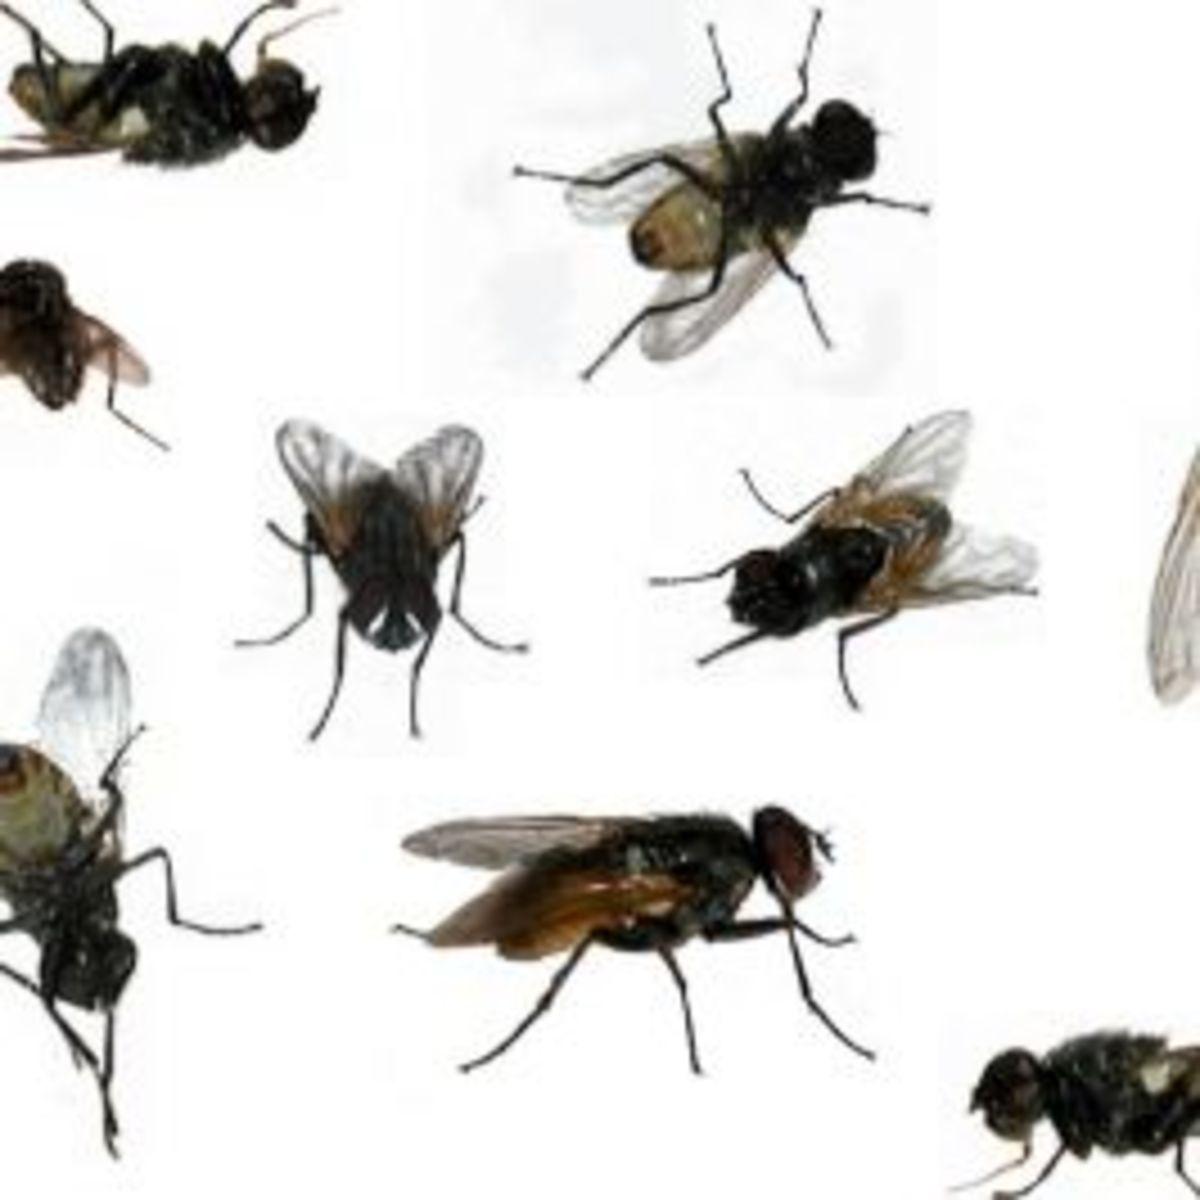 WA is full of flies !